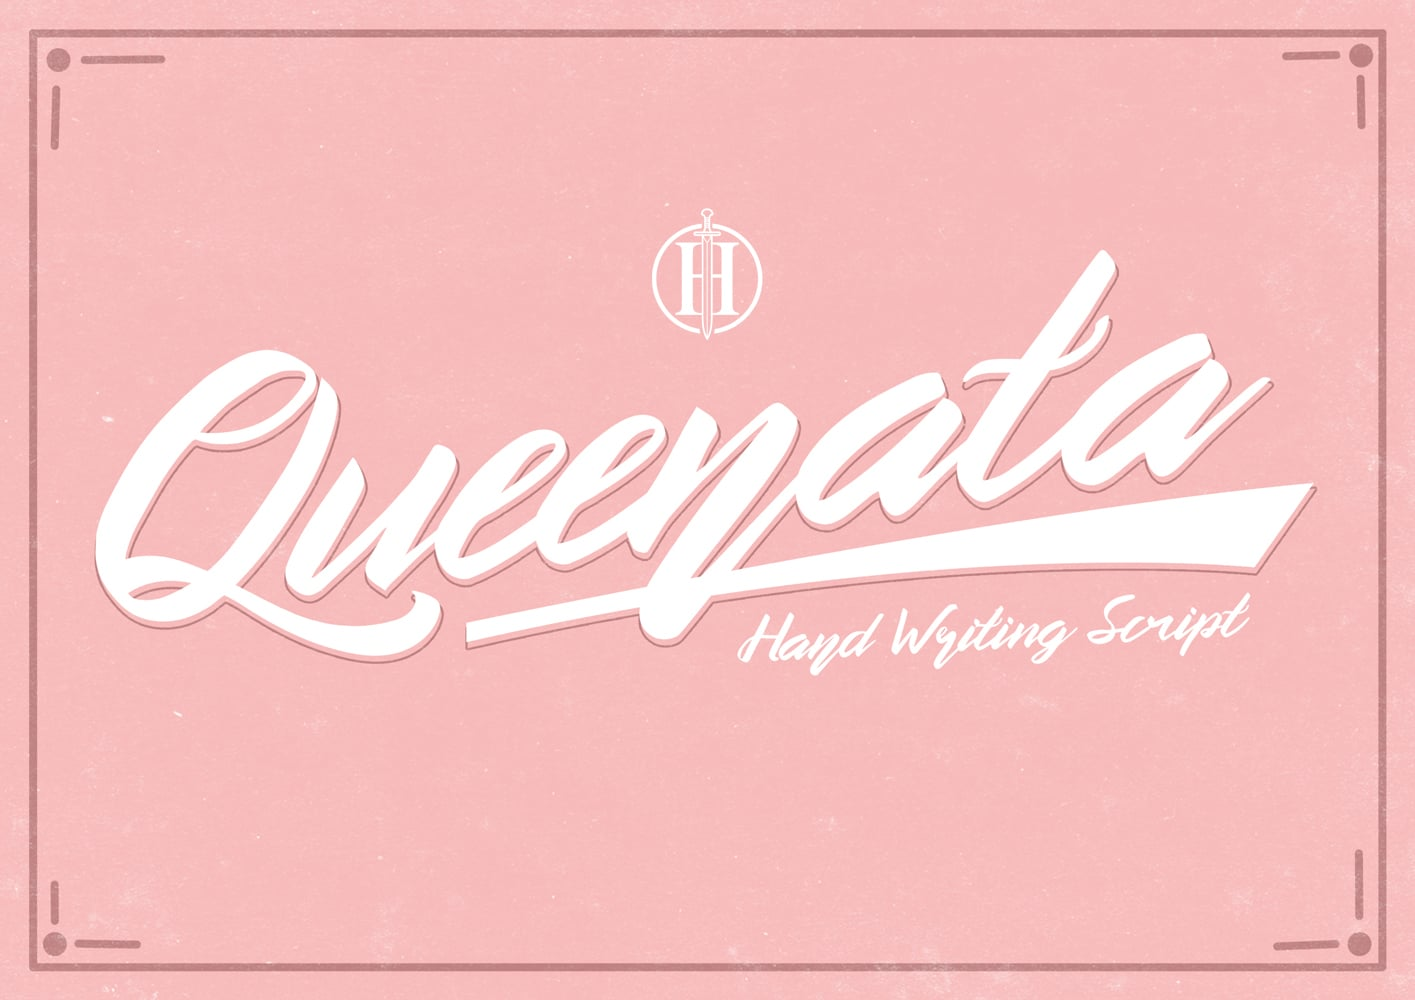 heroglyphs-queenata-01